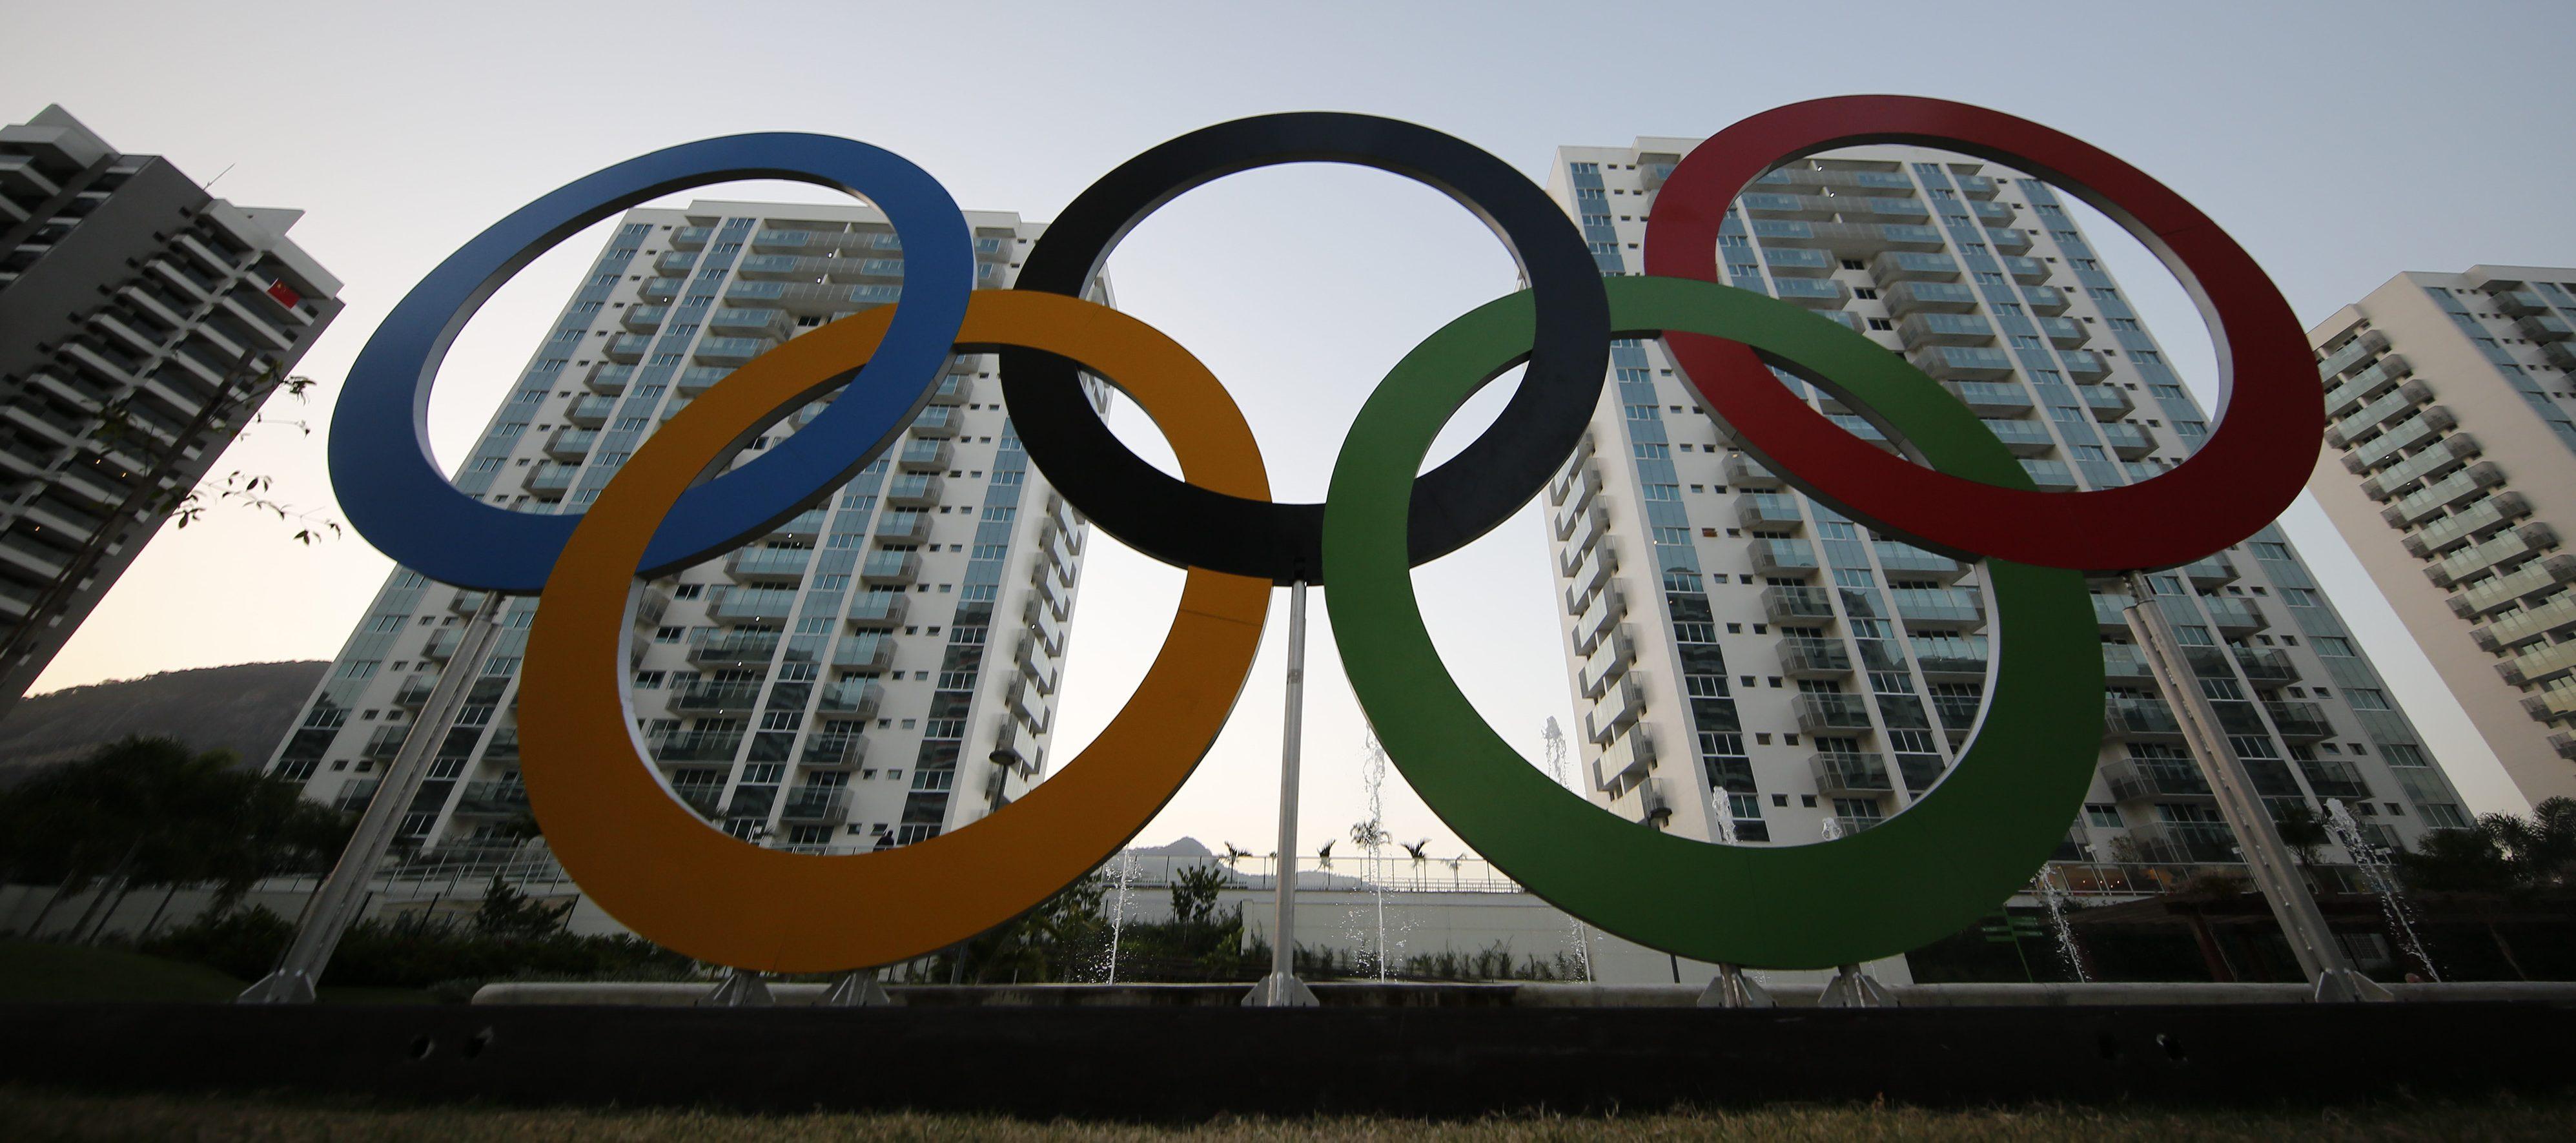 Olympic rings in Rio de Janeiro, Brazil